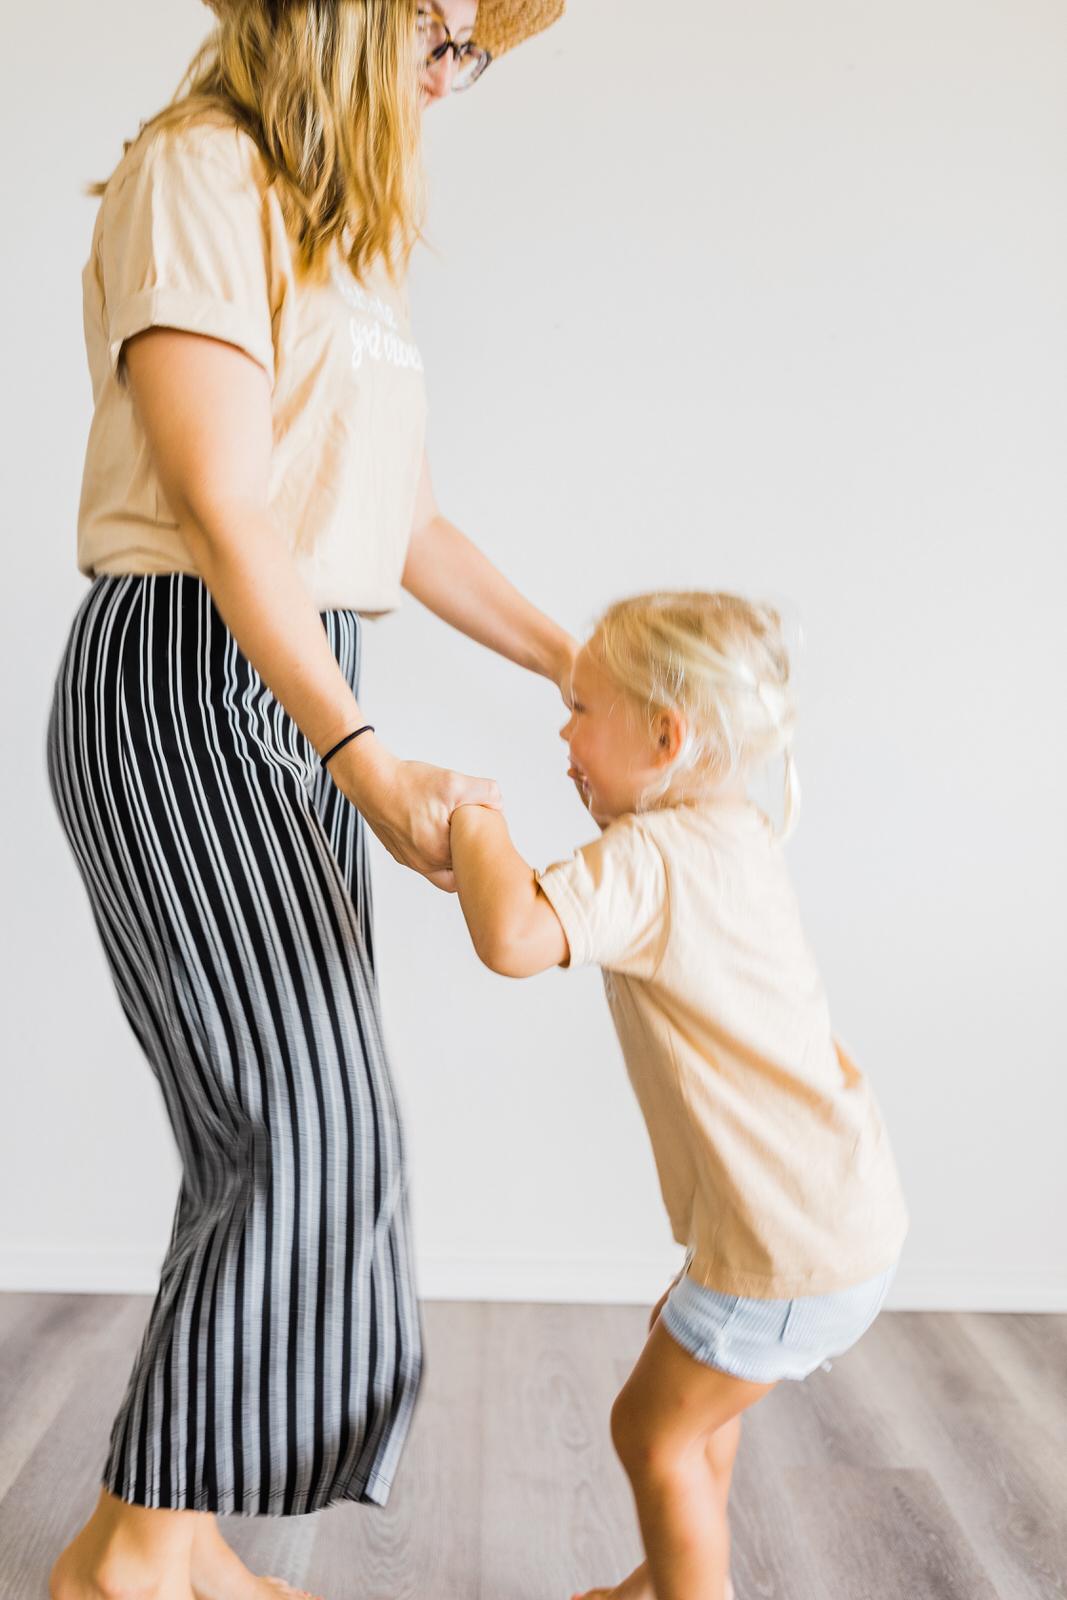 kids-clothes-small-business-collaboration-women-hawaii-7744.jpg